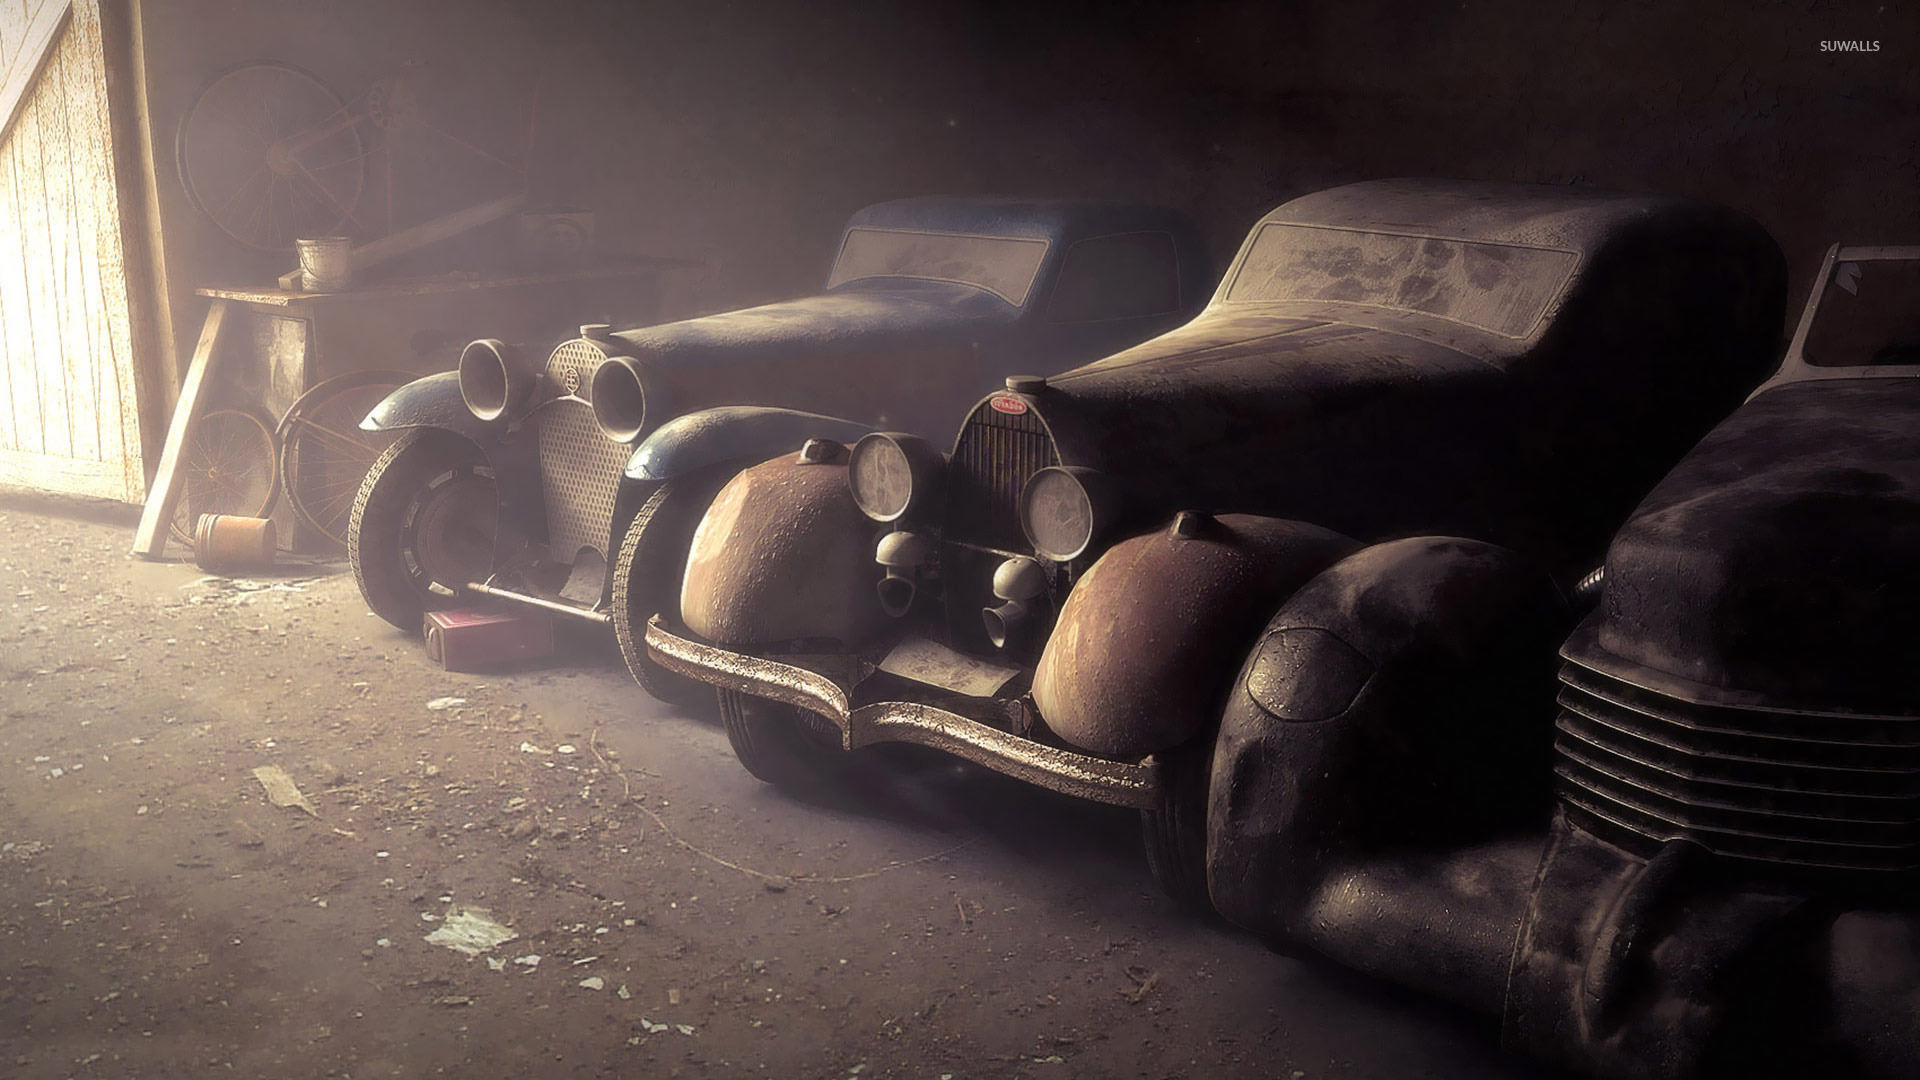 Vintage cars in the garage wallpaper